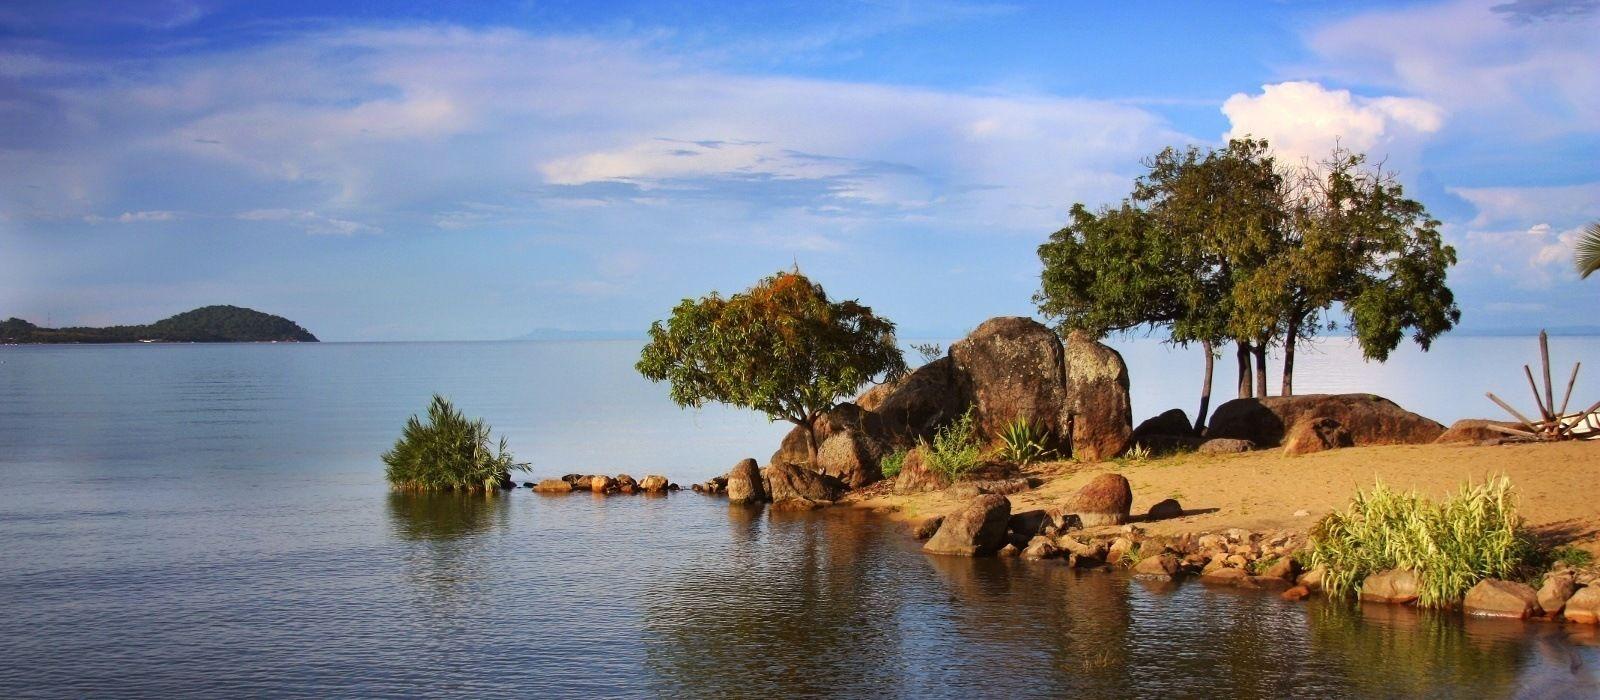 Destination Lake Malawi – Central Lakeshore Malawi